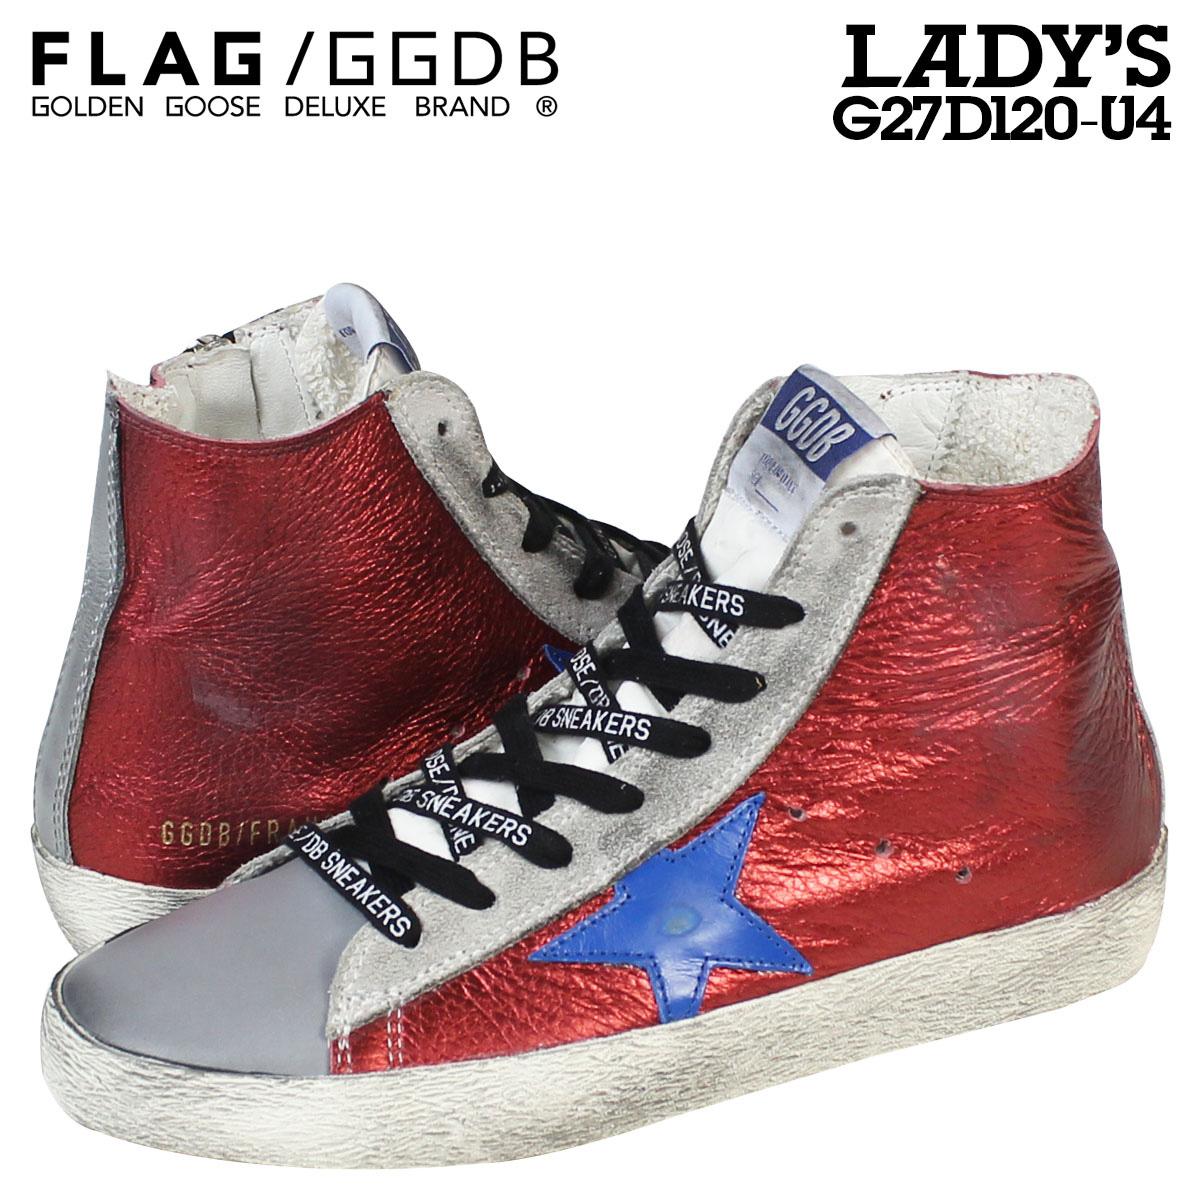 Golden Goose ゴールデングース スニーカー レディース FRANCY イタリア製 G27D120 U4 靴 レッド 赤 グレー